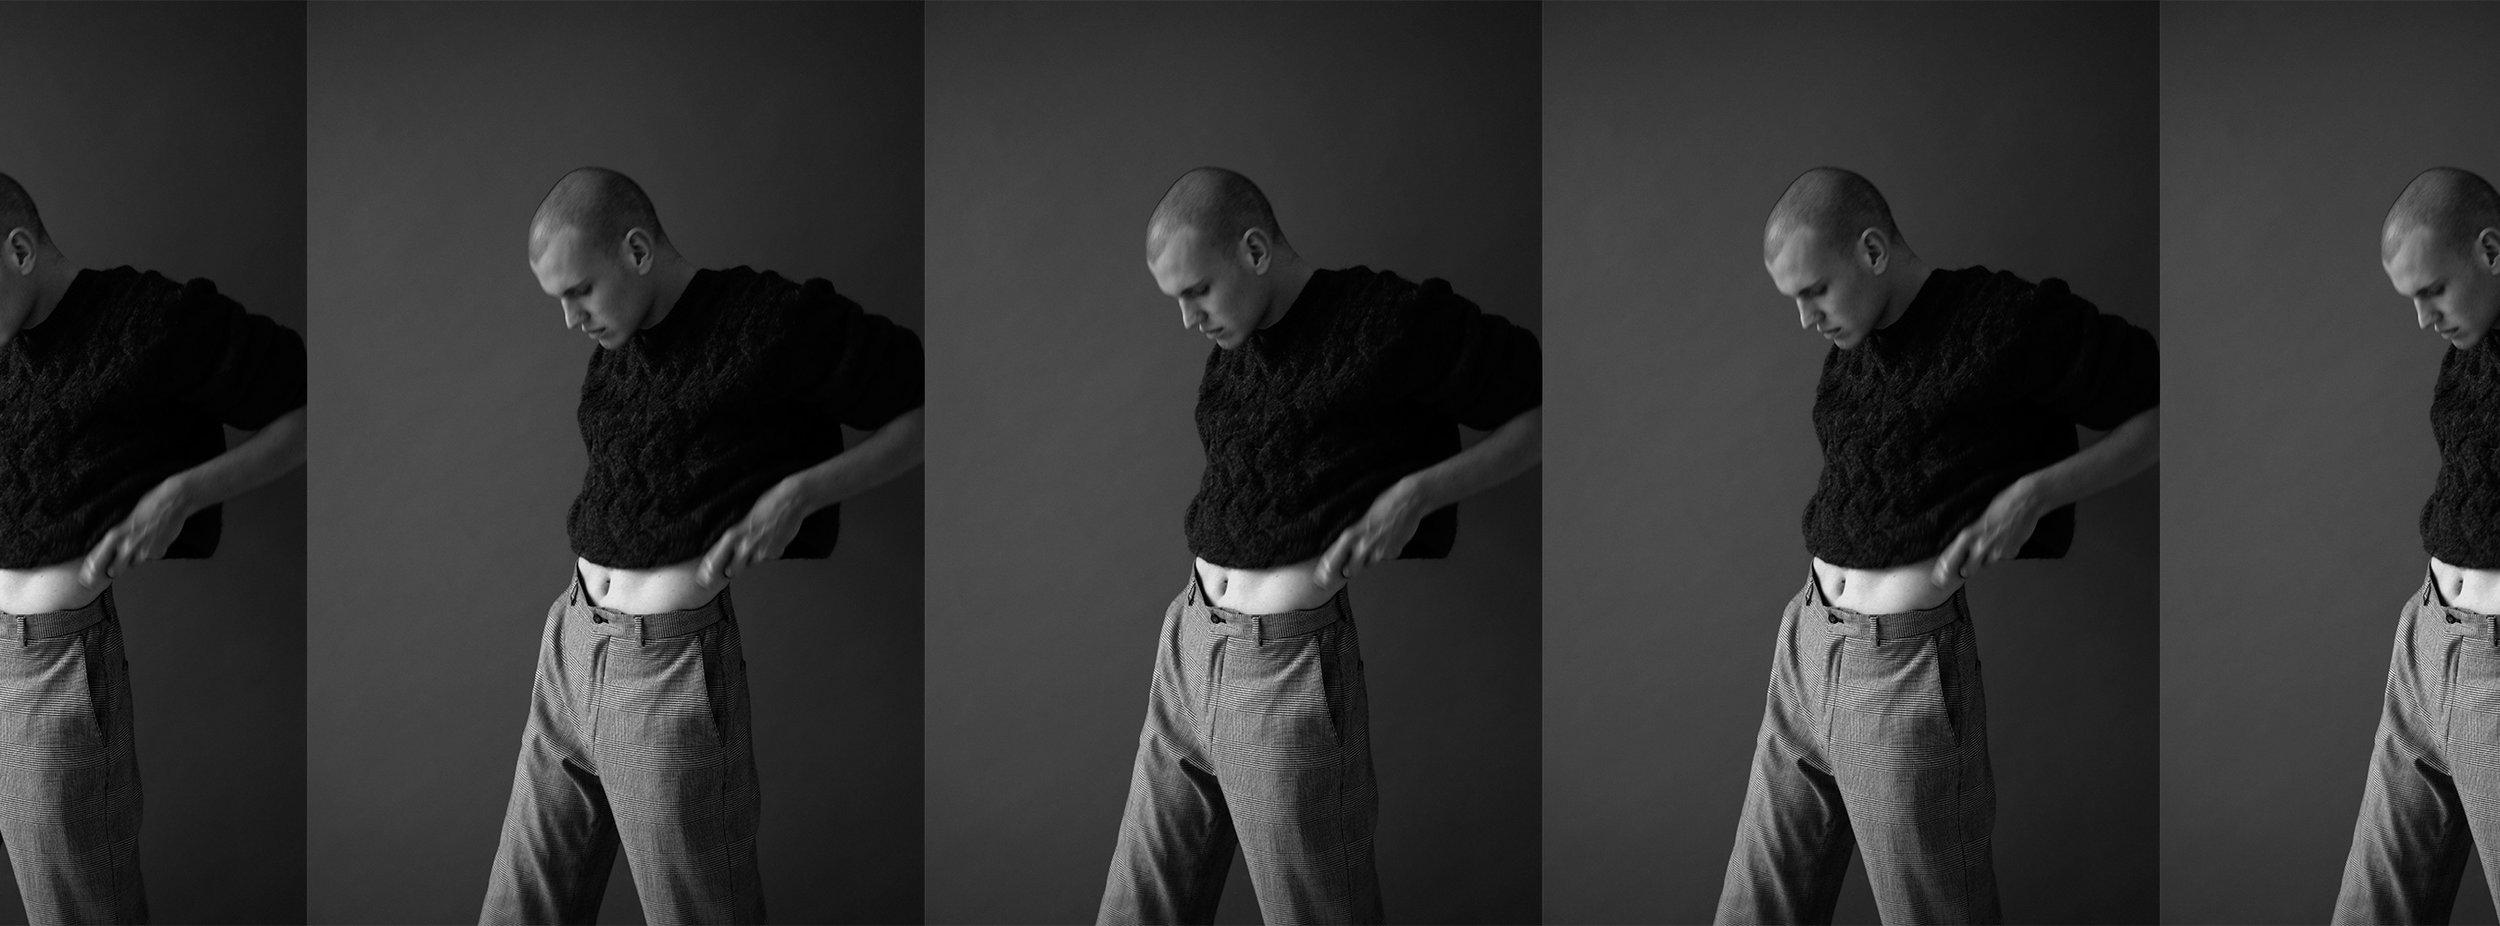 Volker Eichenhofer by WUL Magazine